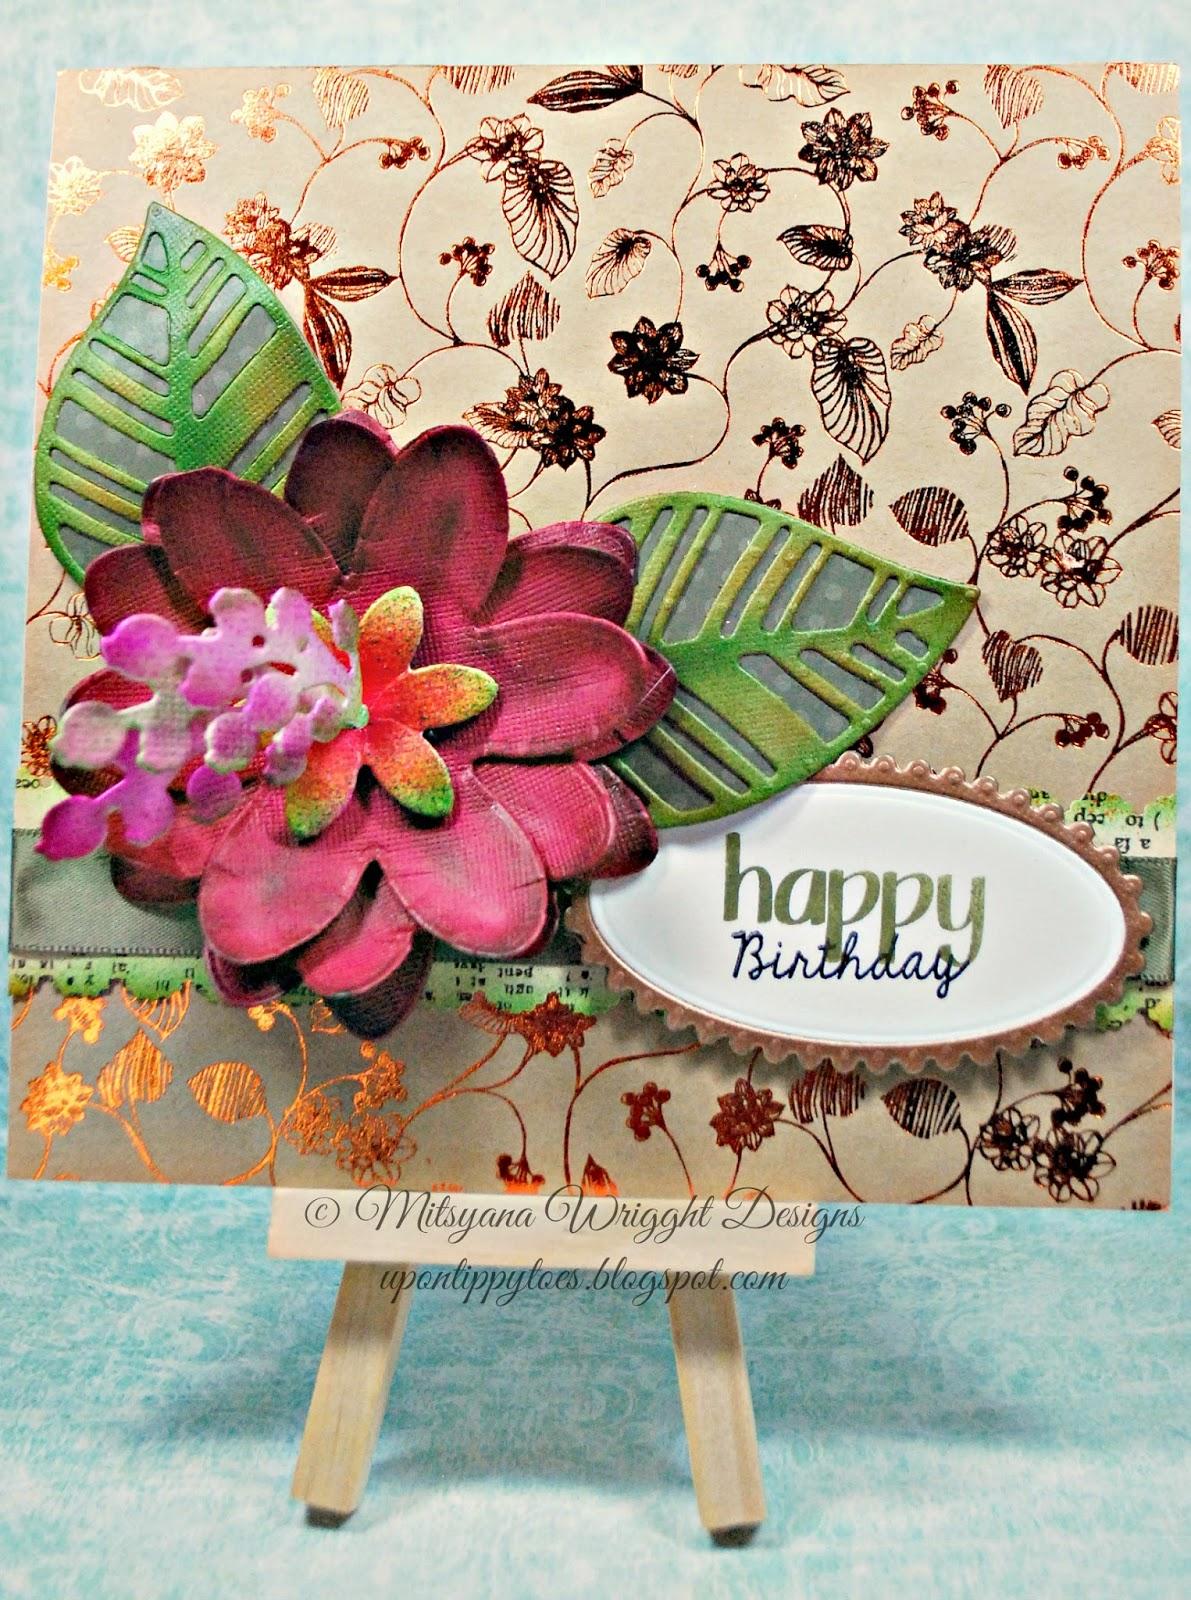 Up on tippy toes 3d flower birthday card 3d flower birthday card izmirmasajfo